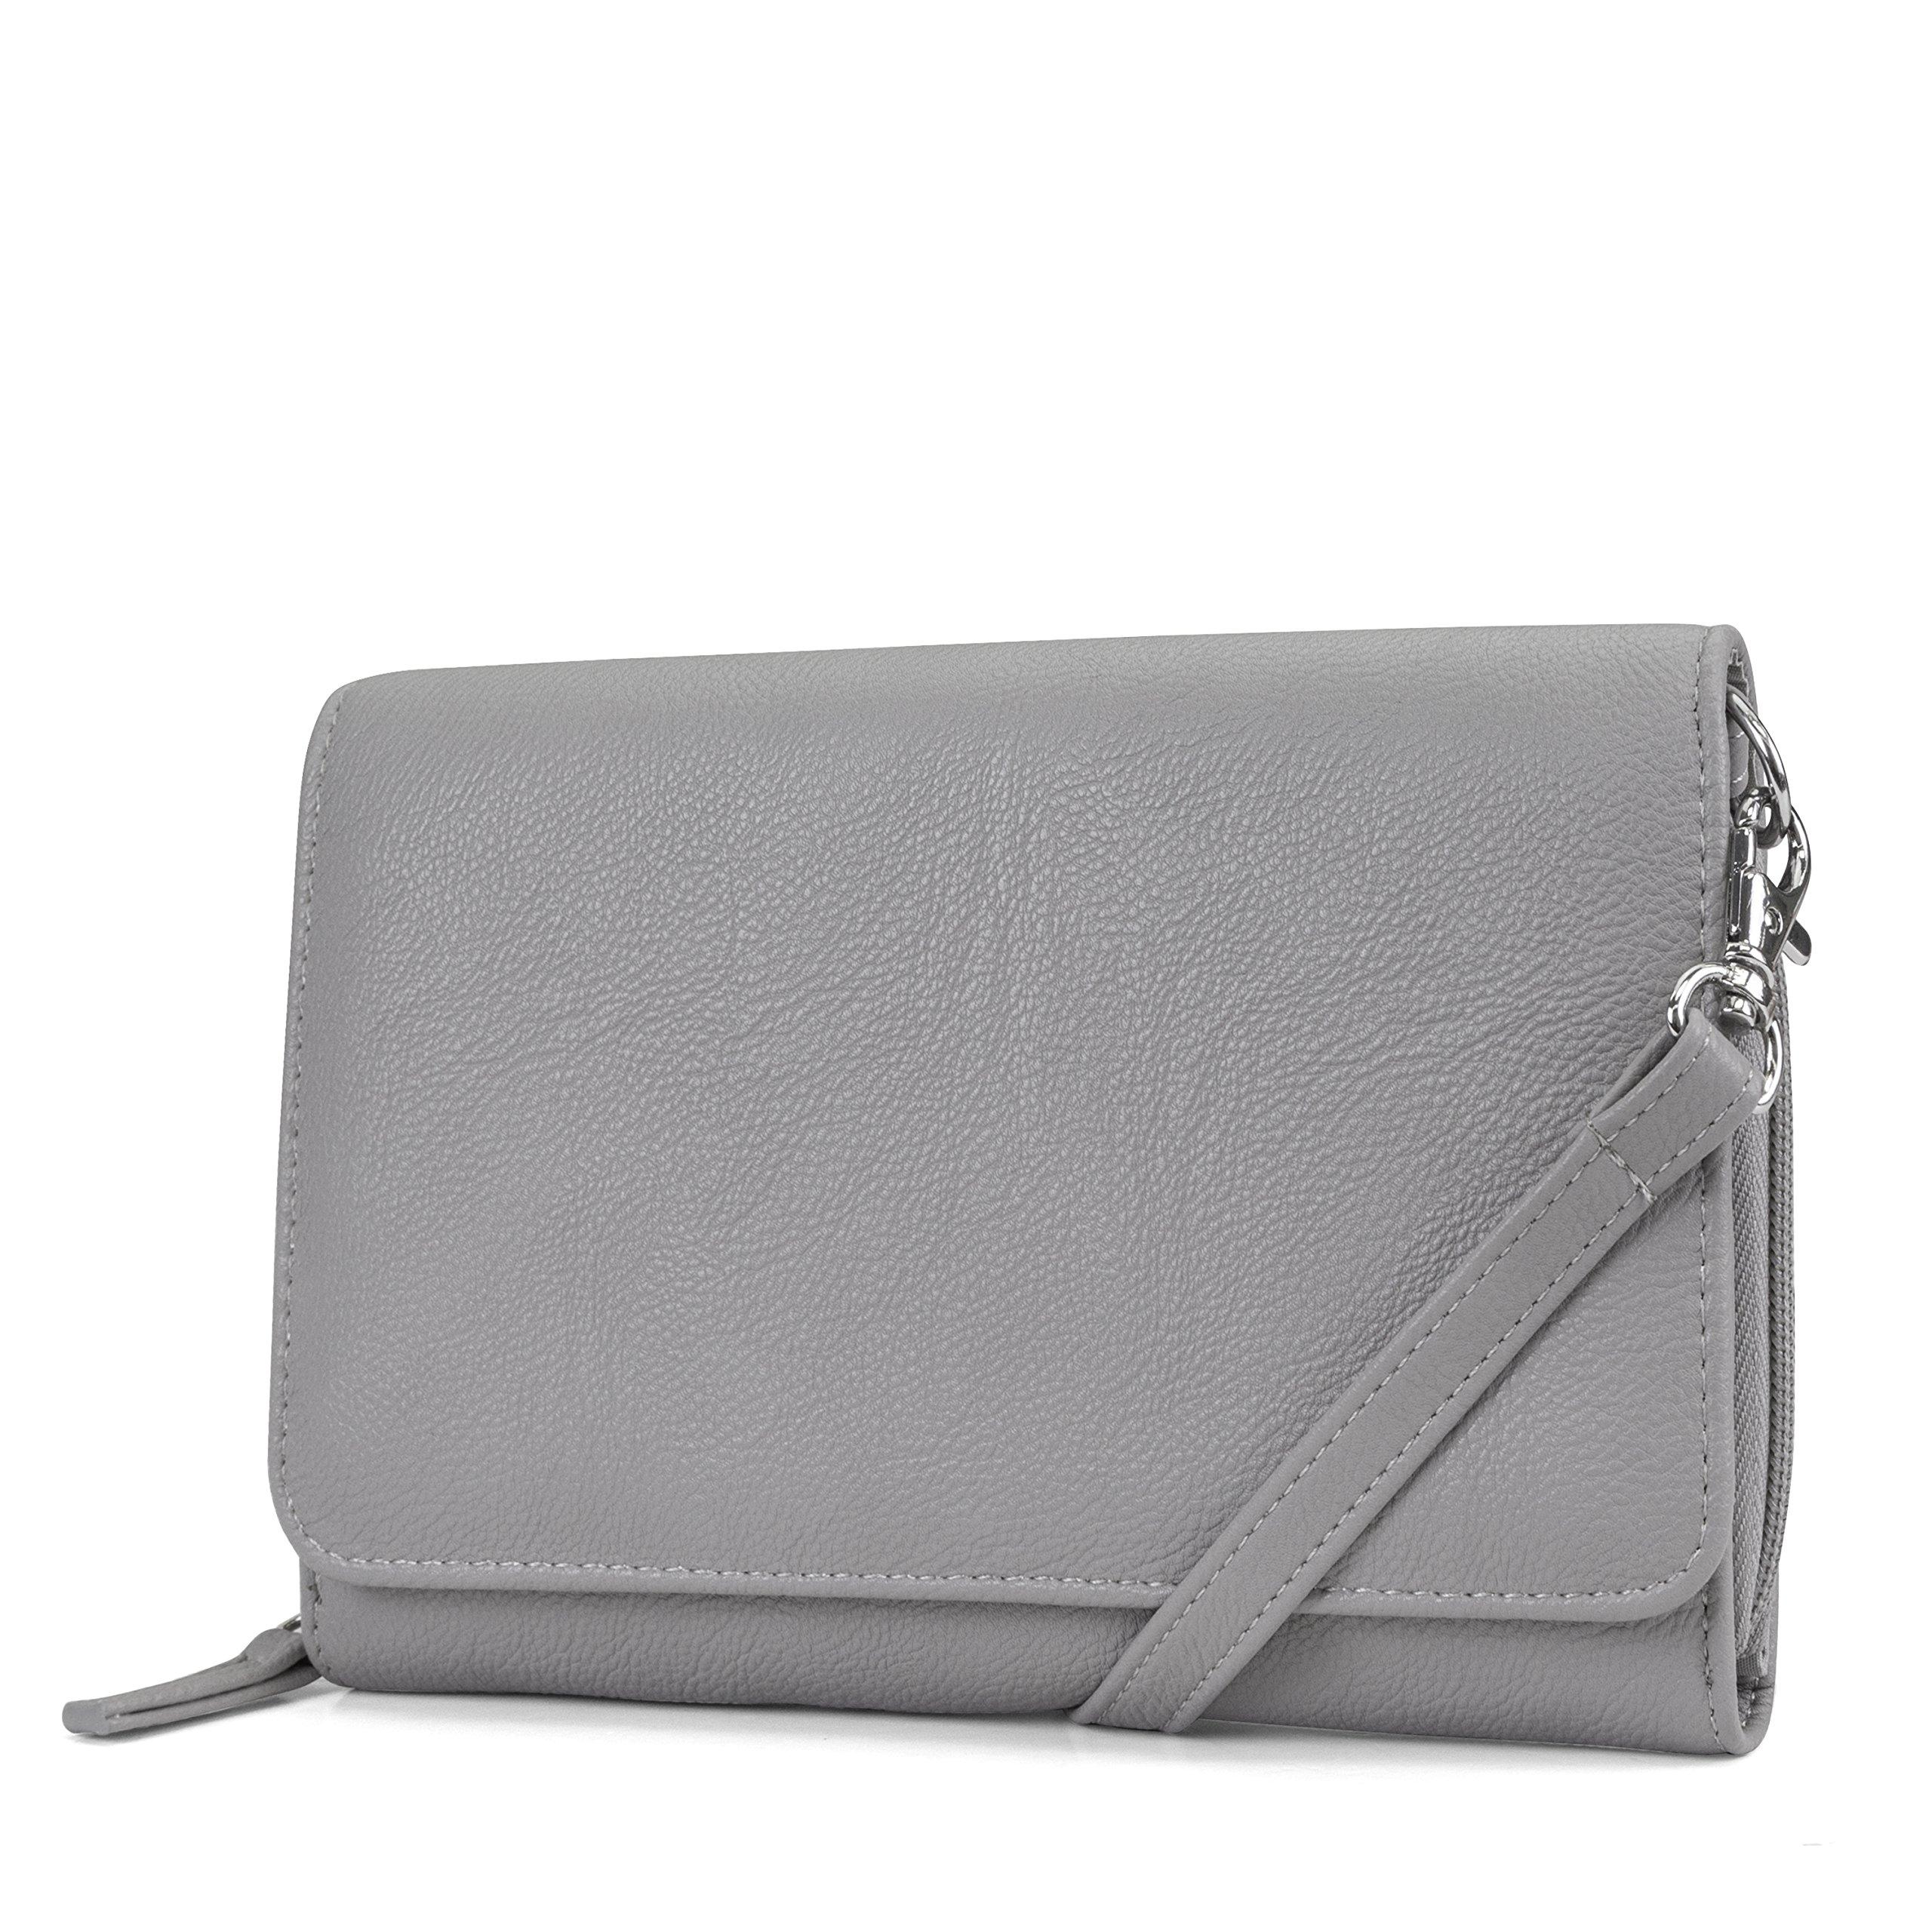 Mundi RFID Crossbody Bag For Women Anti Theft Travel Purse Handbag Wallet Vegan Leather (Grey)